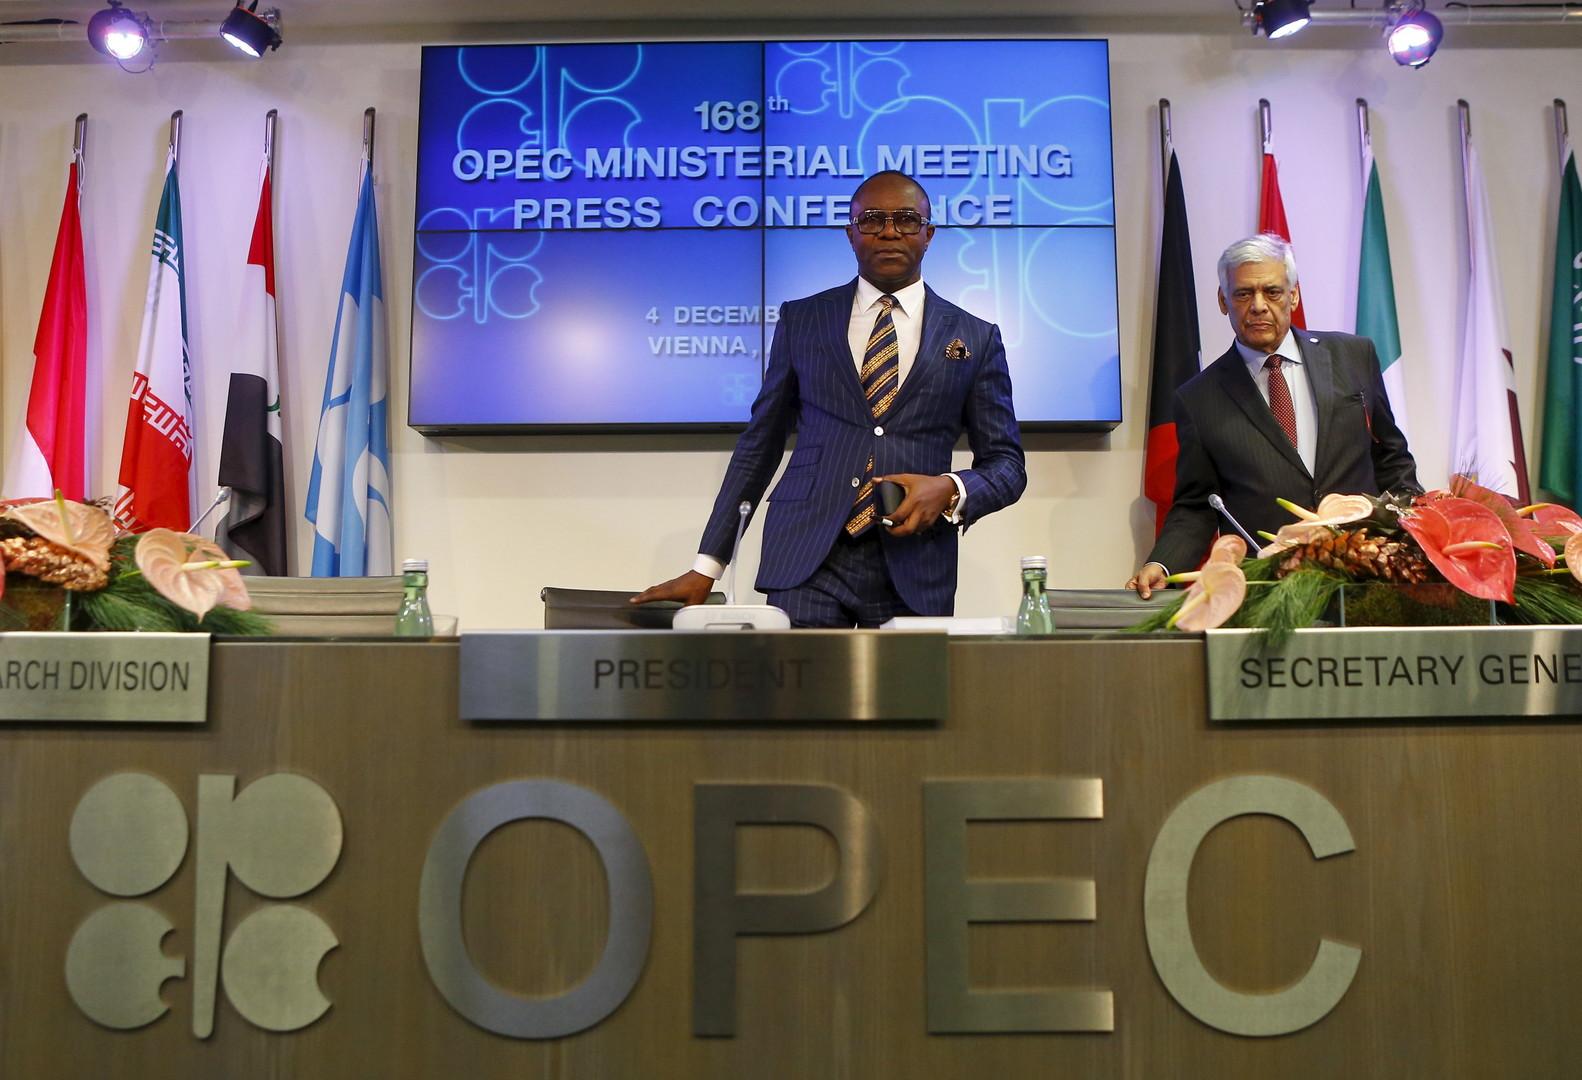 Nigerias Öl-Minister und OPEC-Präsident Kachikwu